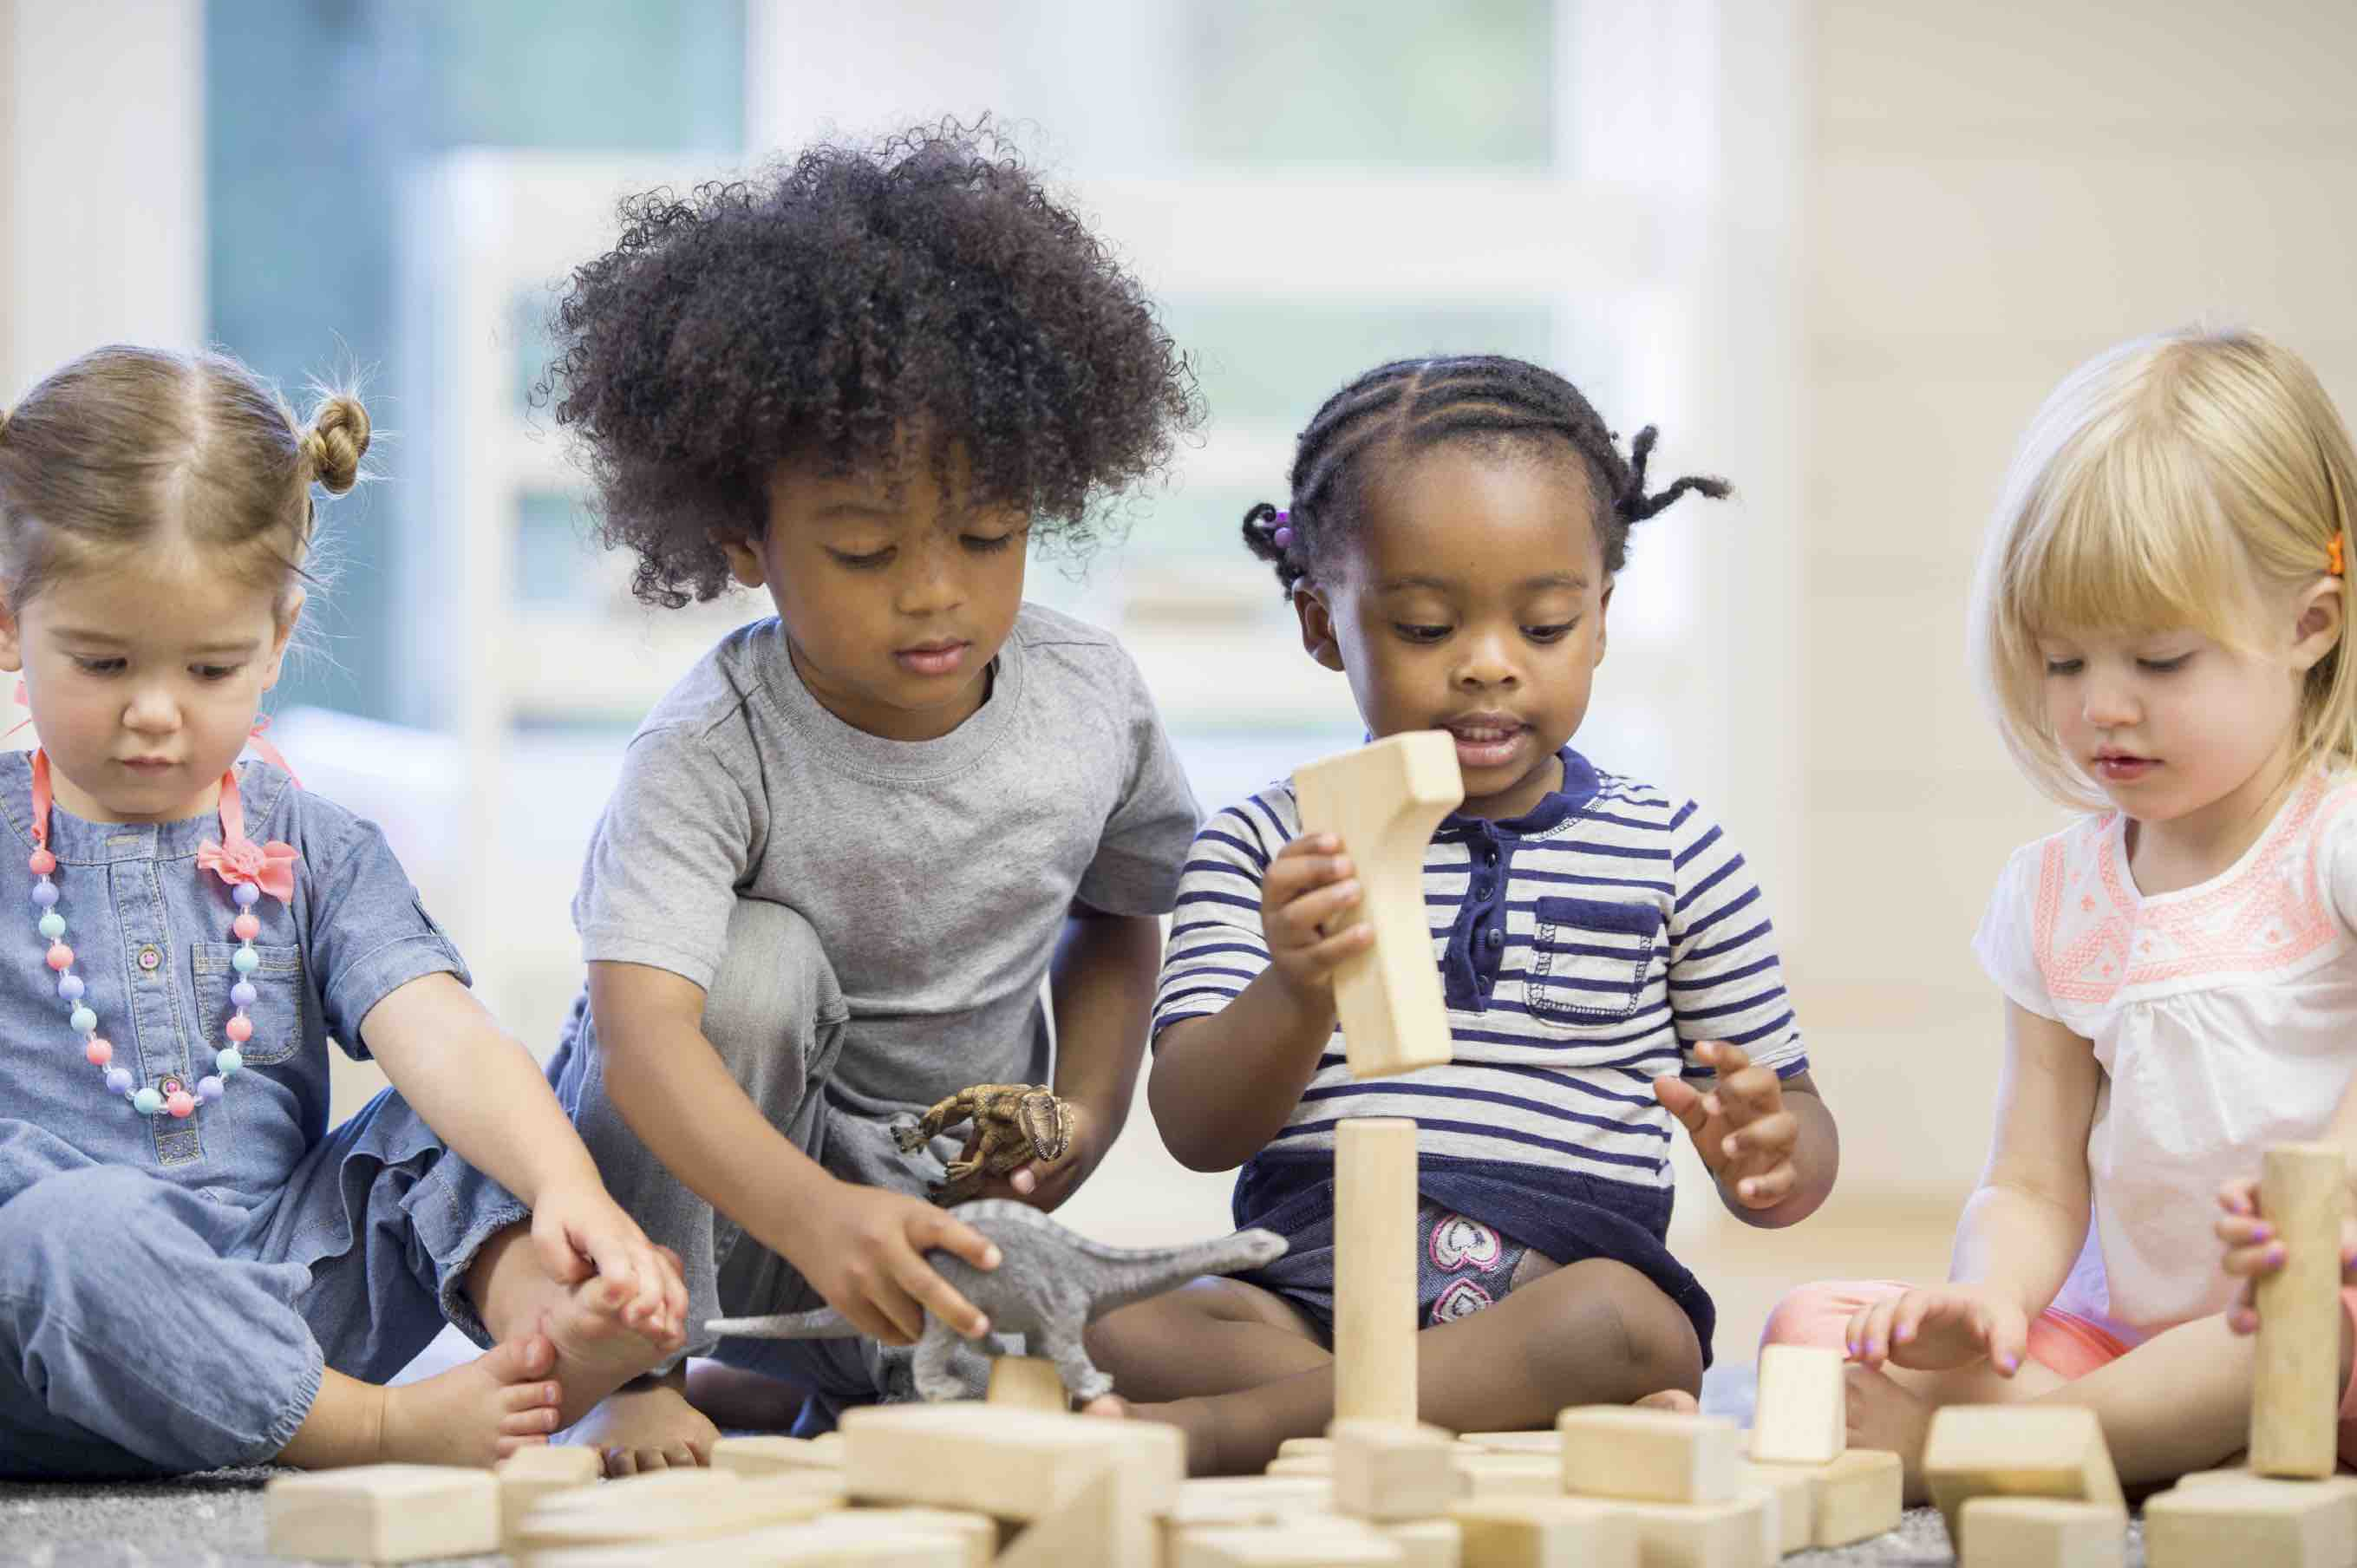 preschool kids playing preschool primer comparing different preschool styles 316